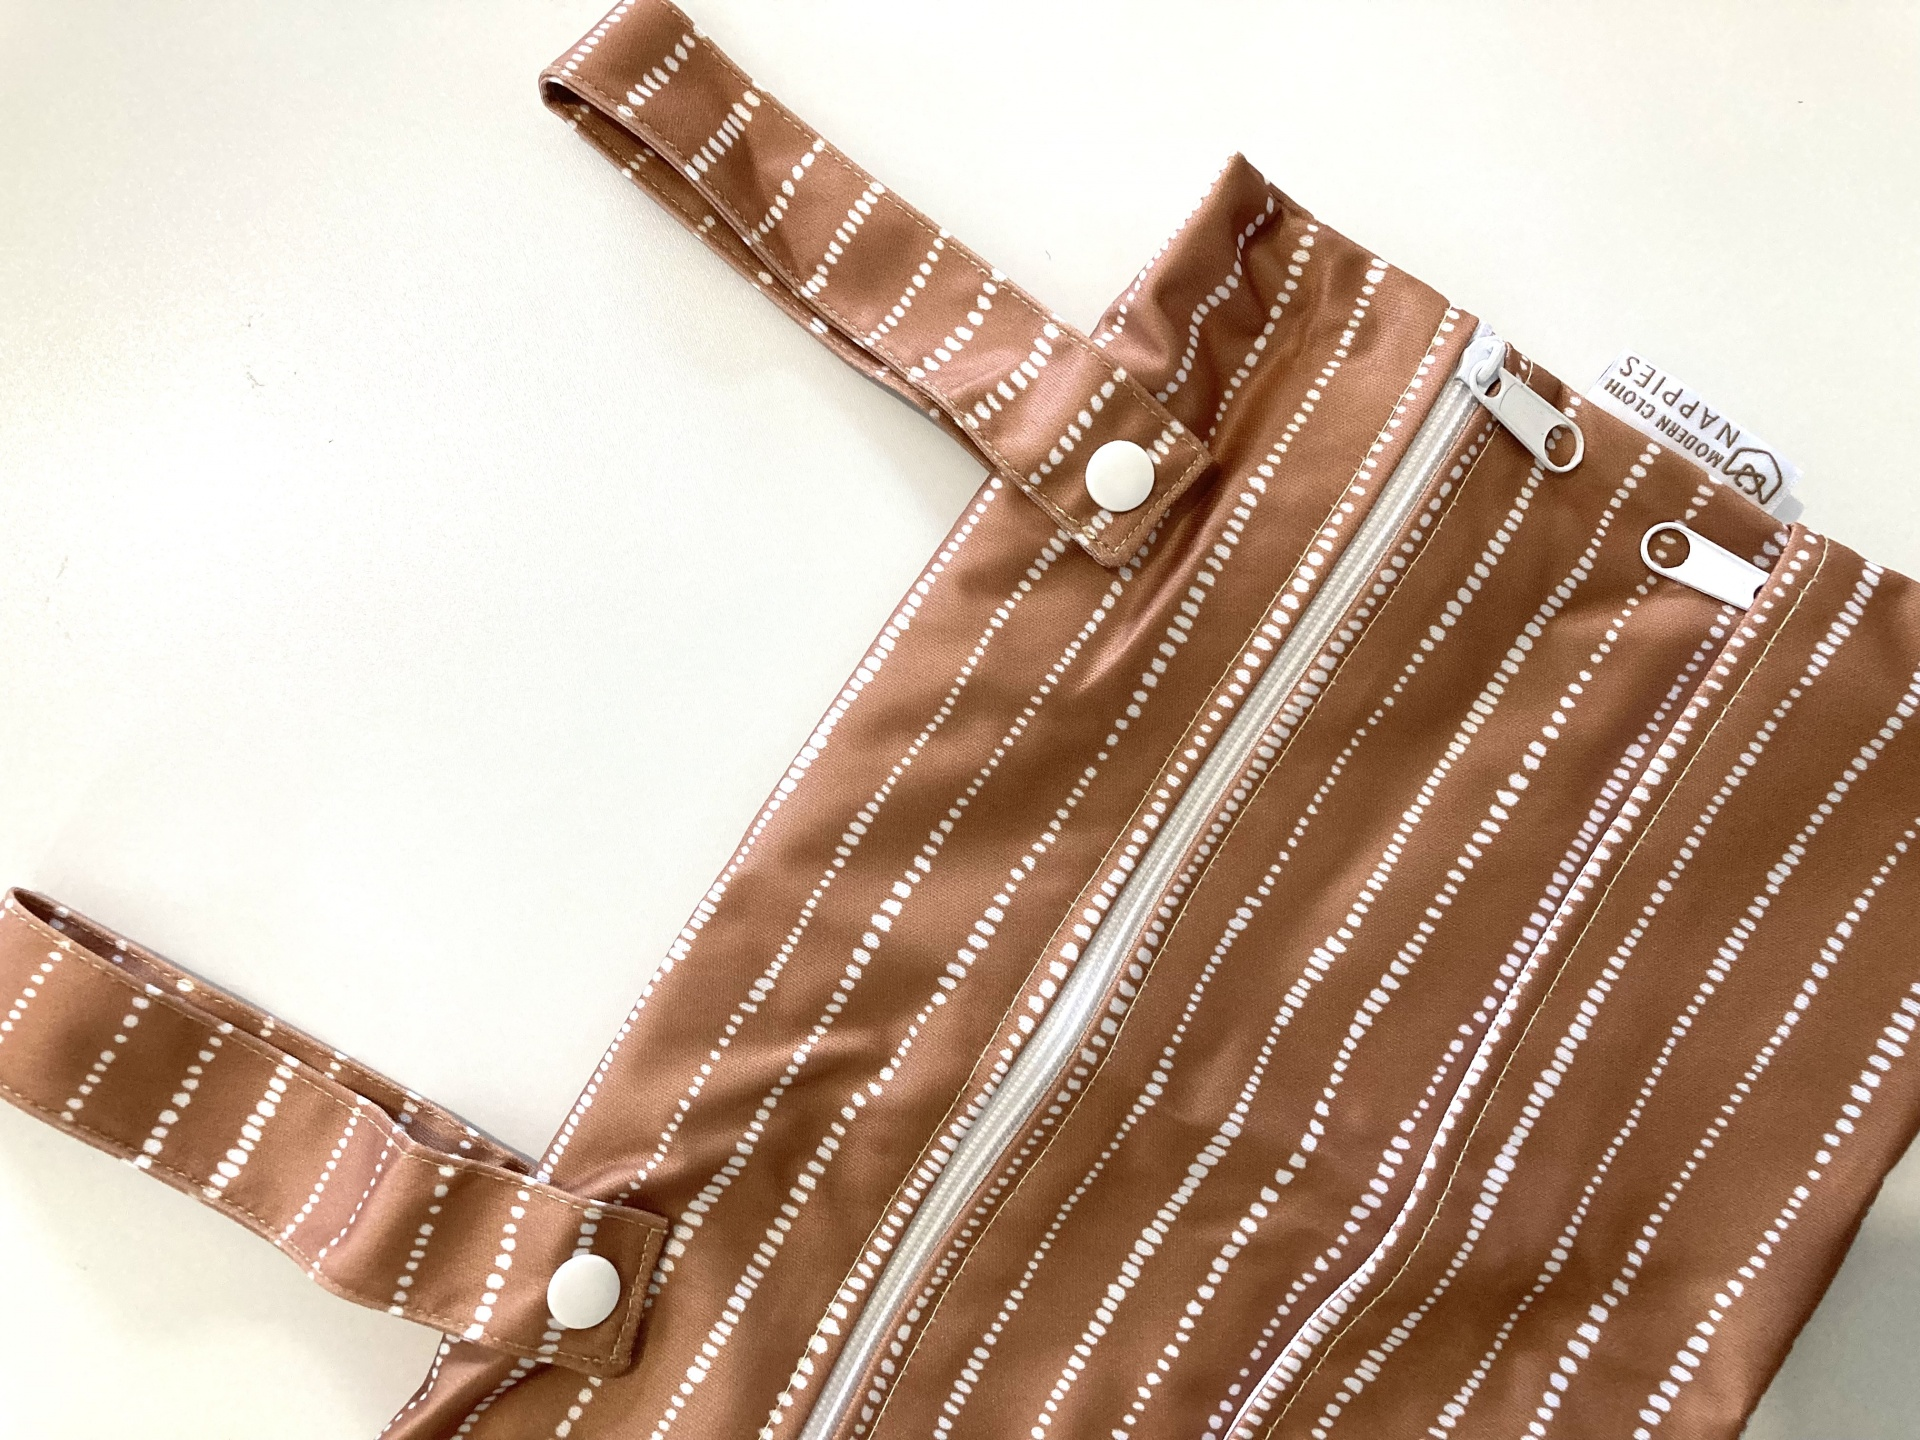 SACOS DE TRANSPORTE - MODERN CLOTH NAPPIES